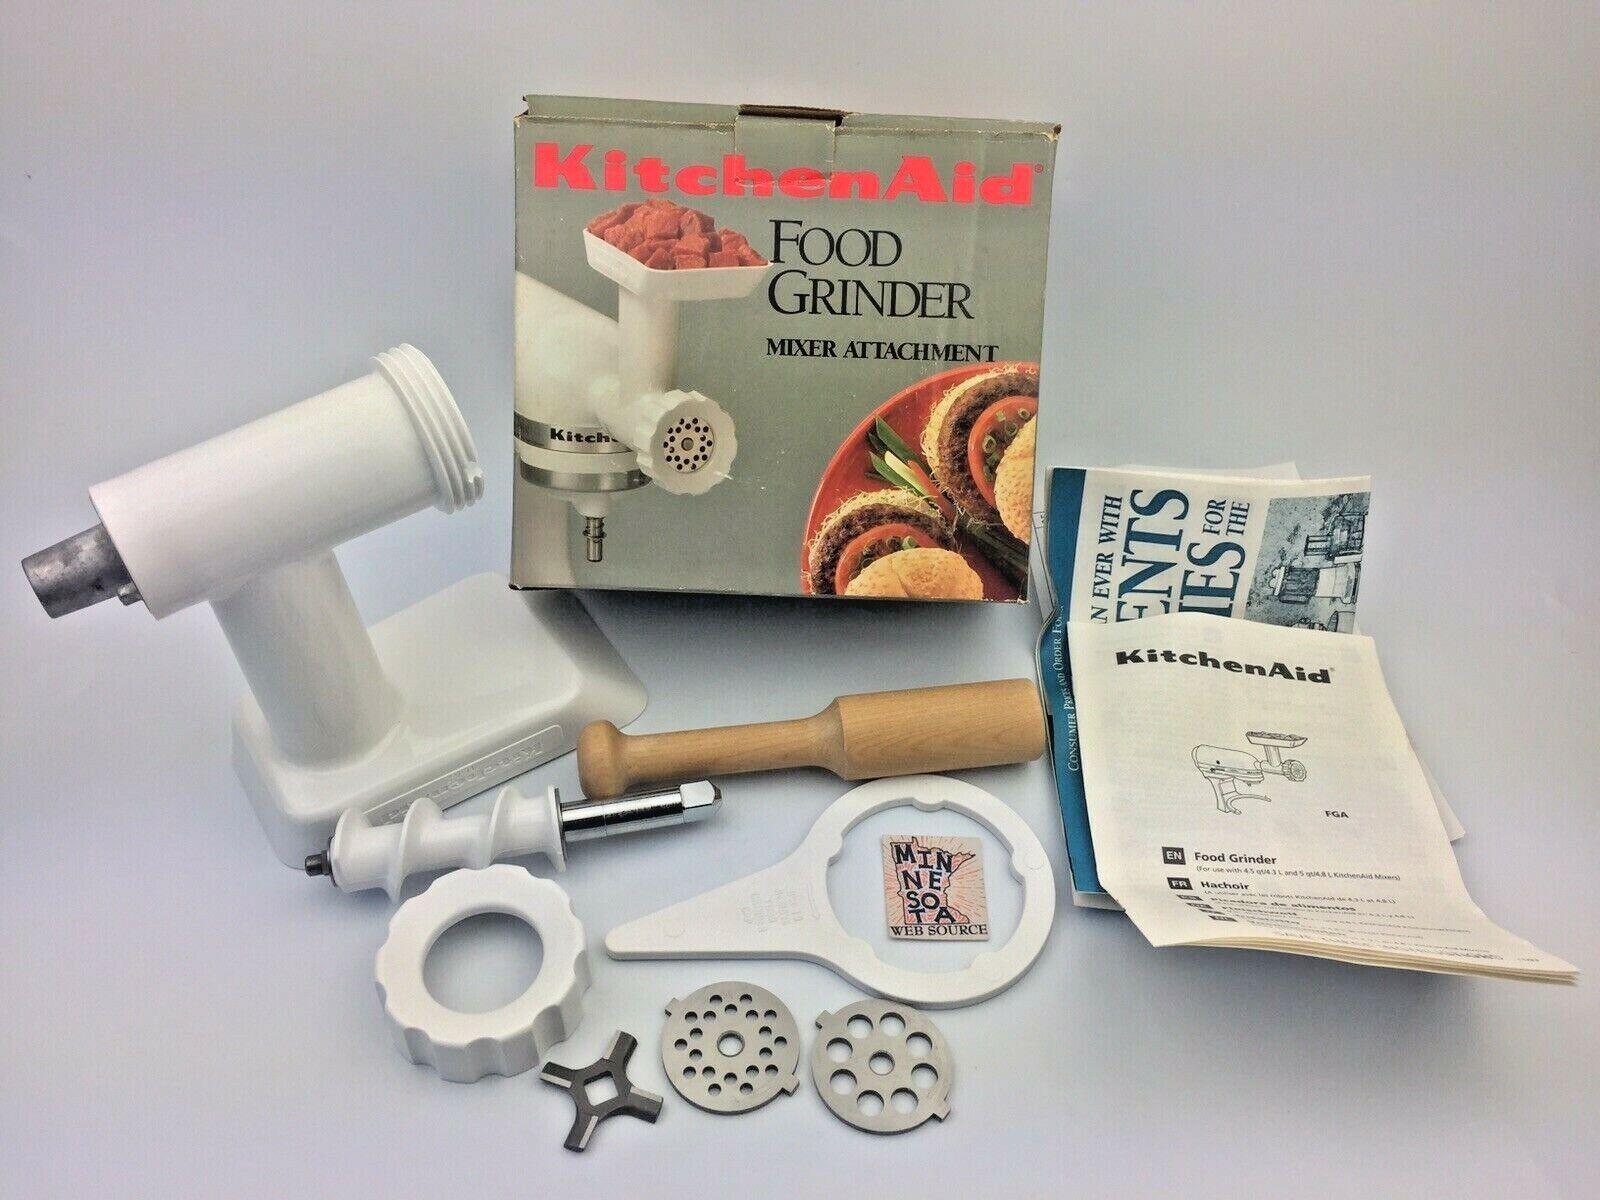 Kitchenaid Factory Refubished FGA Food Grinder Attachment